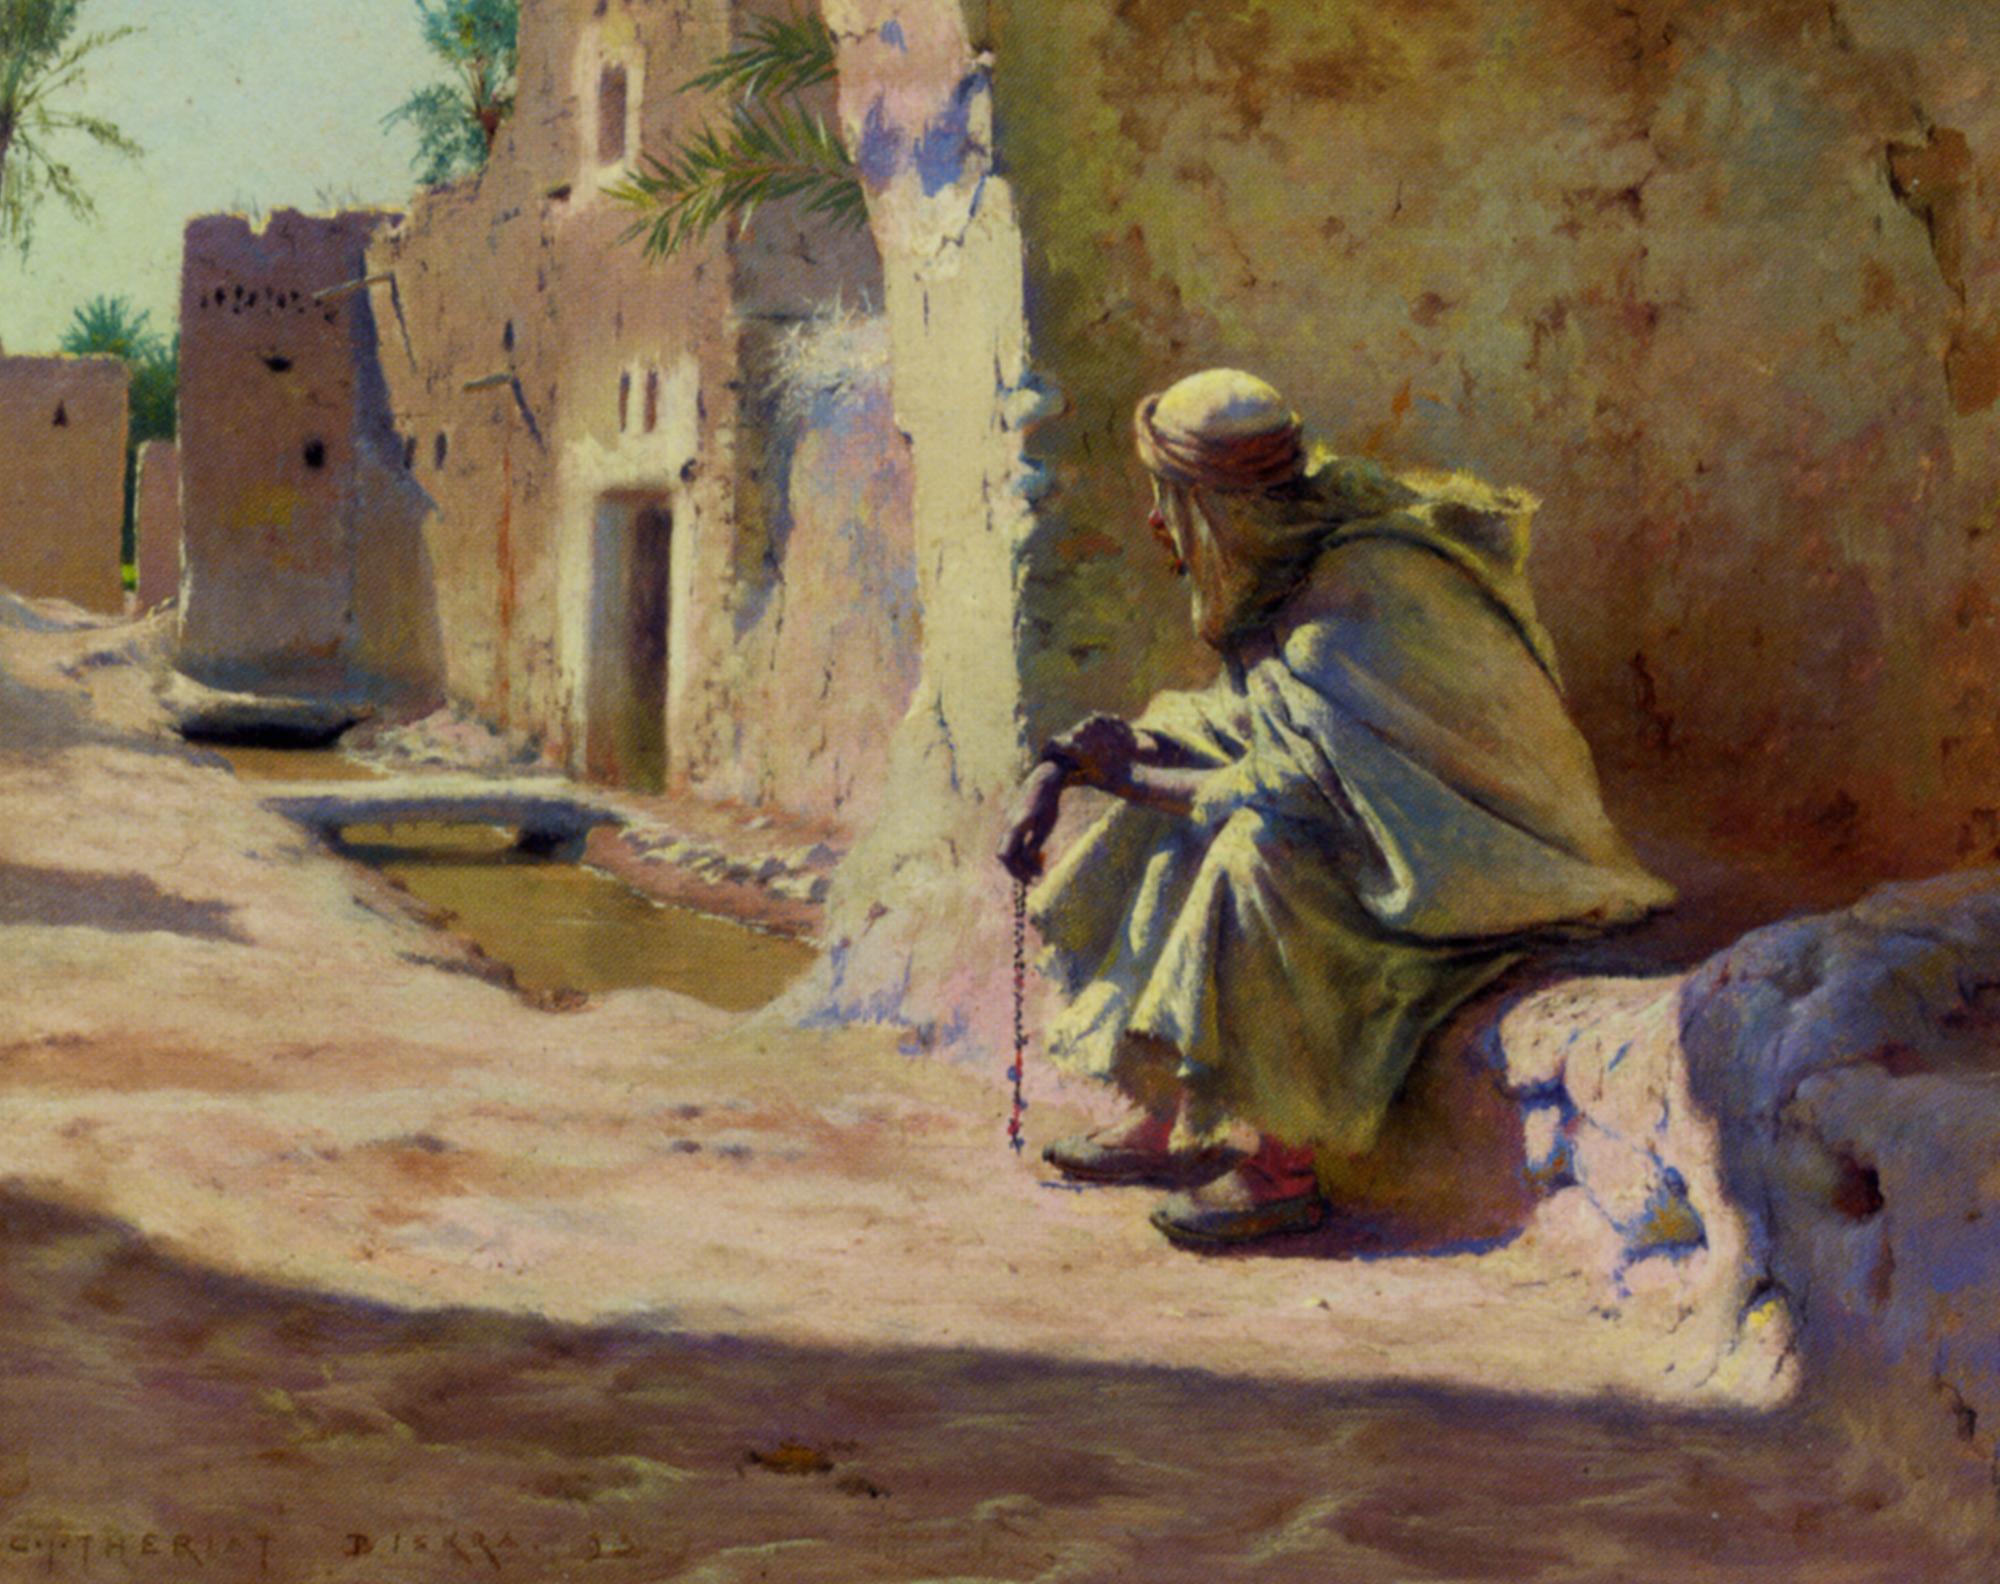 In the Shade, Biskra :: Charles James Theriat - scenes of Oriental life (Orientalism) in art and painting ôîòî